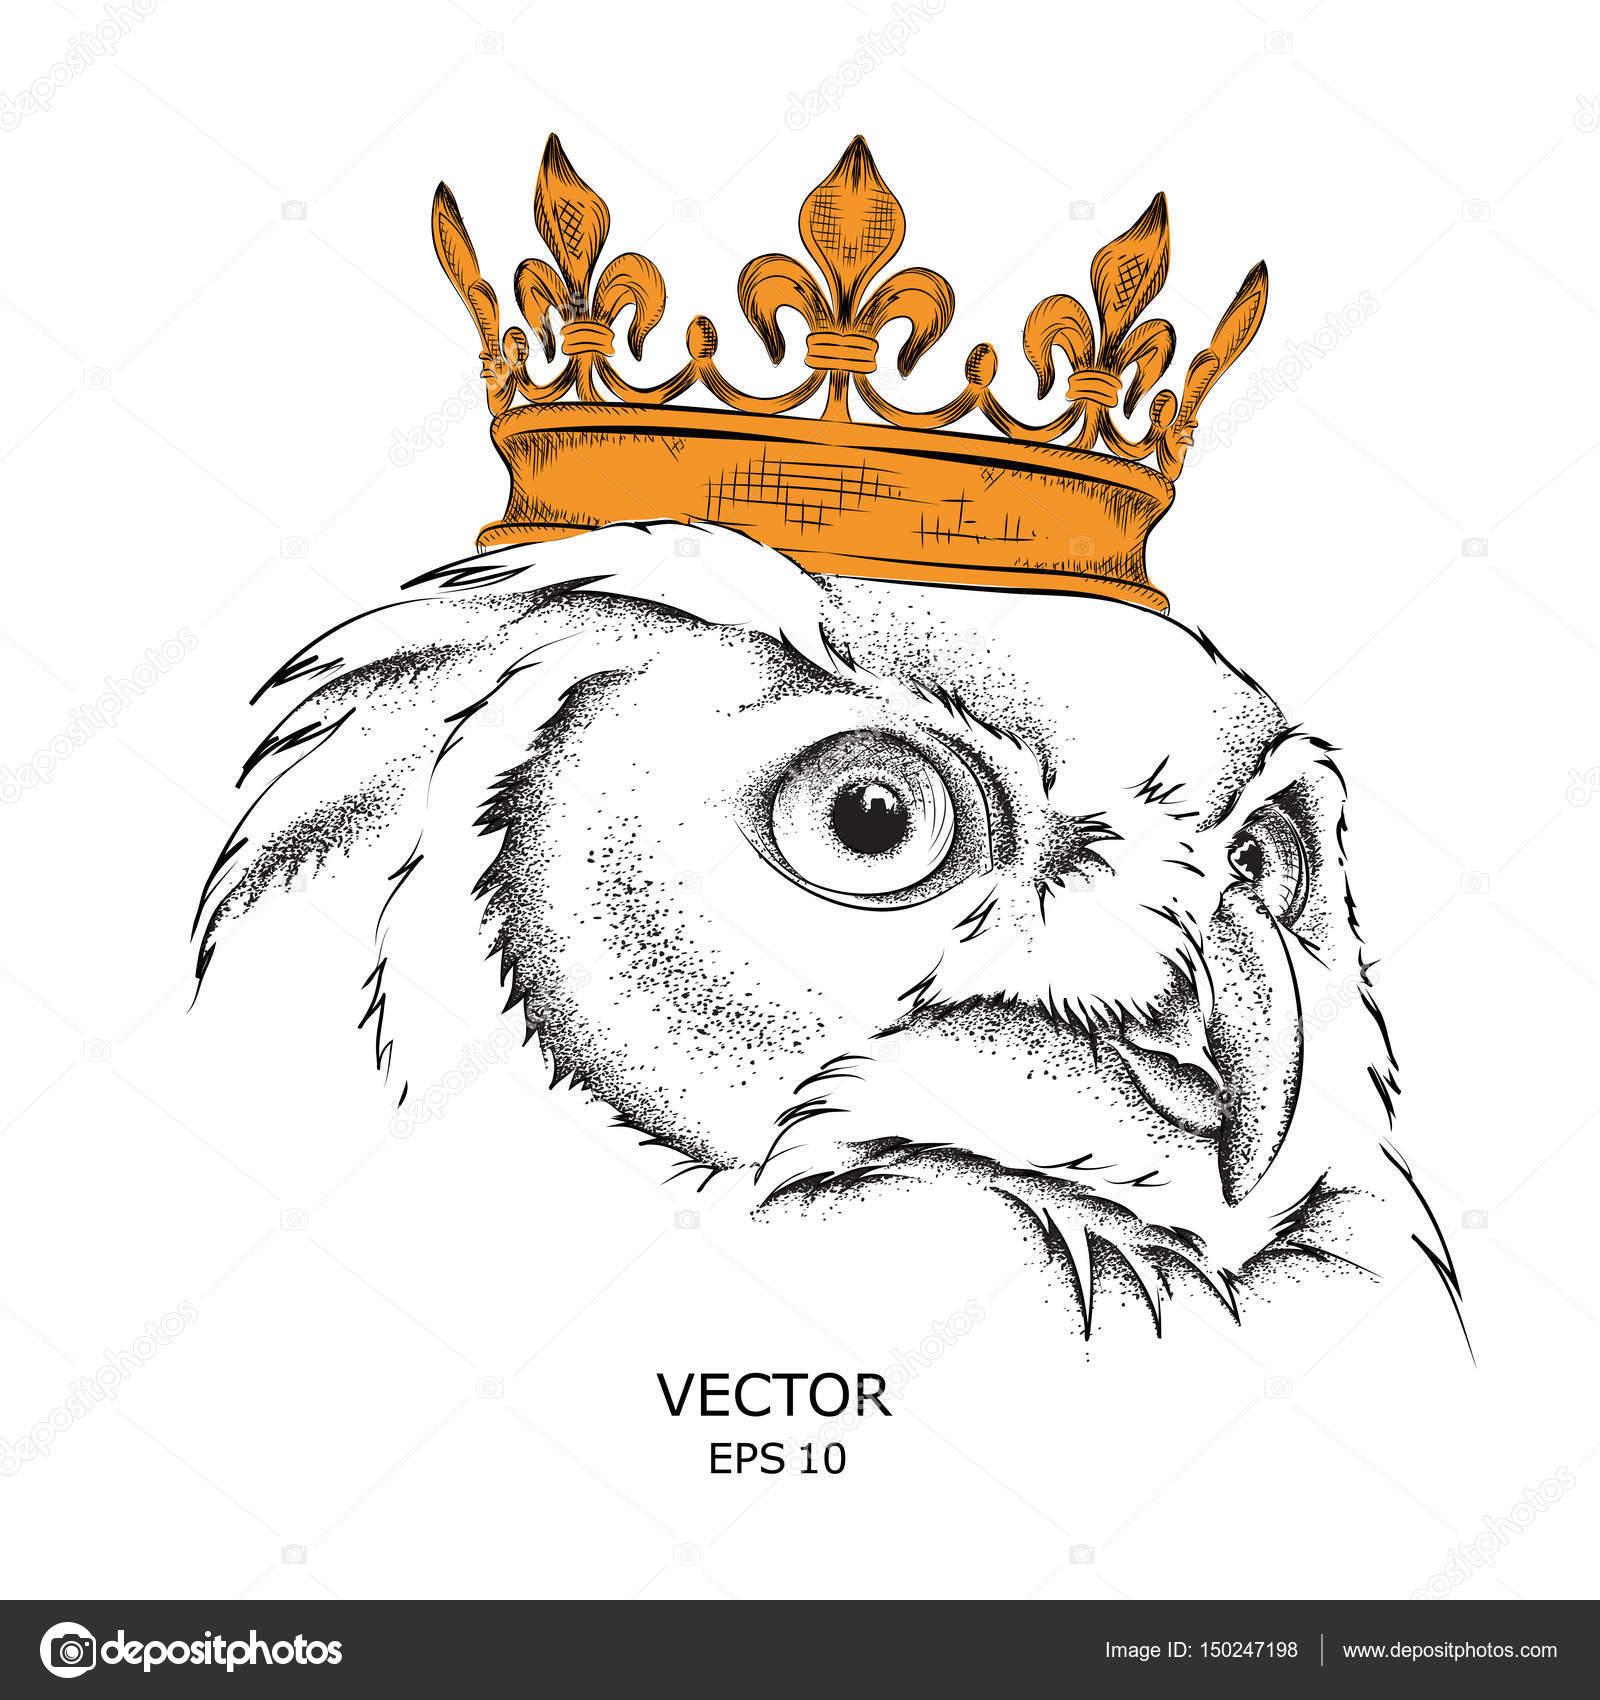 Diseño De Coronas Para Tatuar Mano Dibujar Buho Del Retrato De La